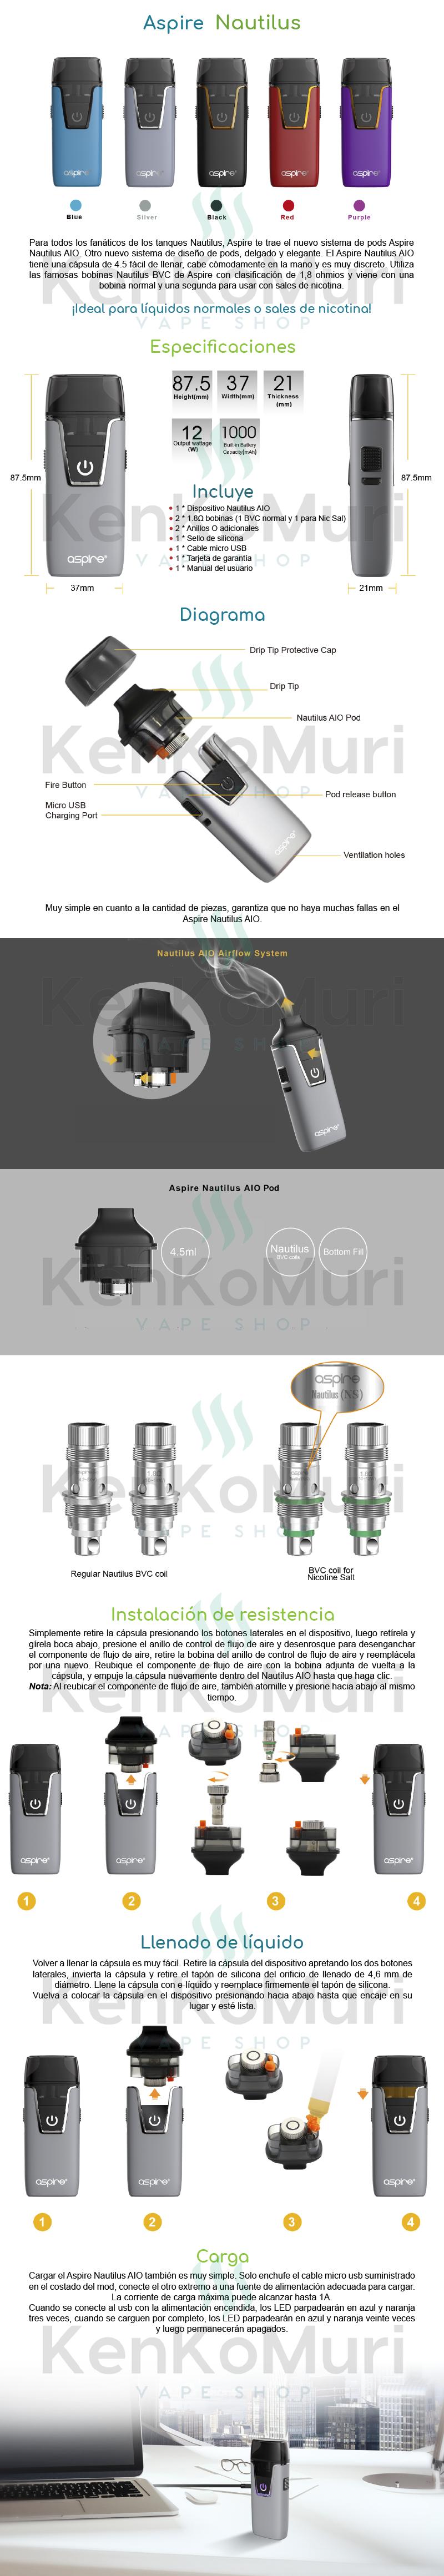 cigarroelectronico-vapeador-aspire-nautilusaio-mexico-kenkomuri